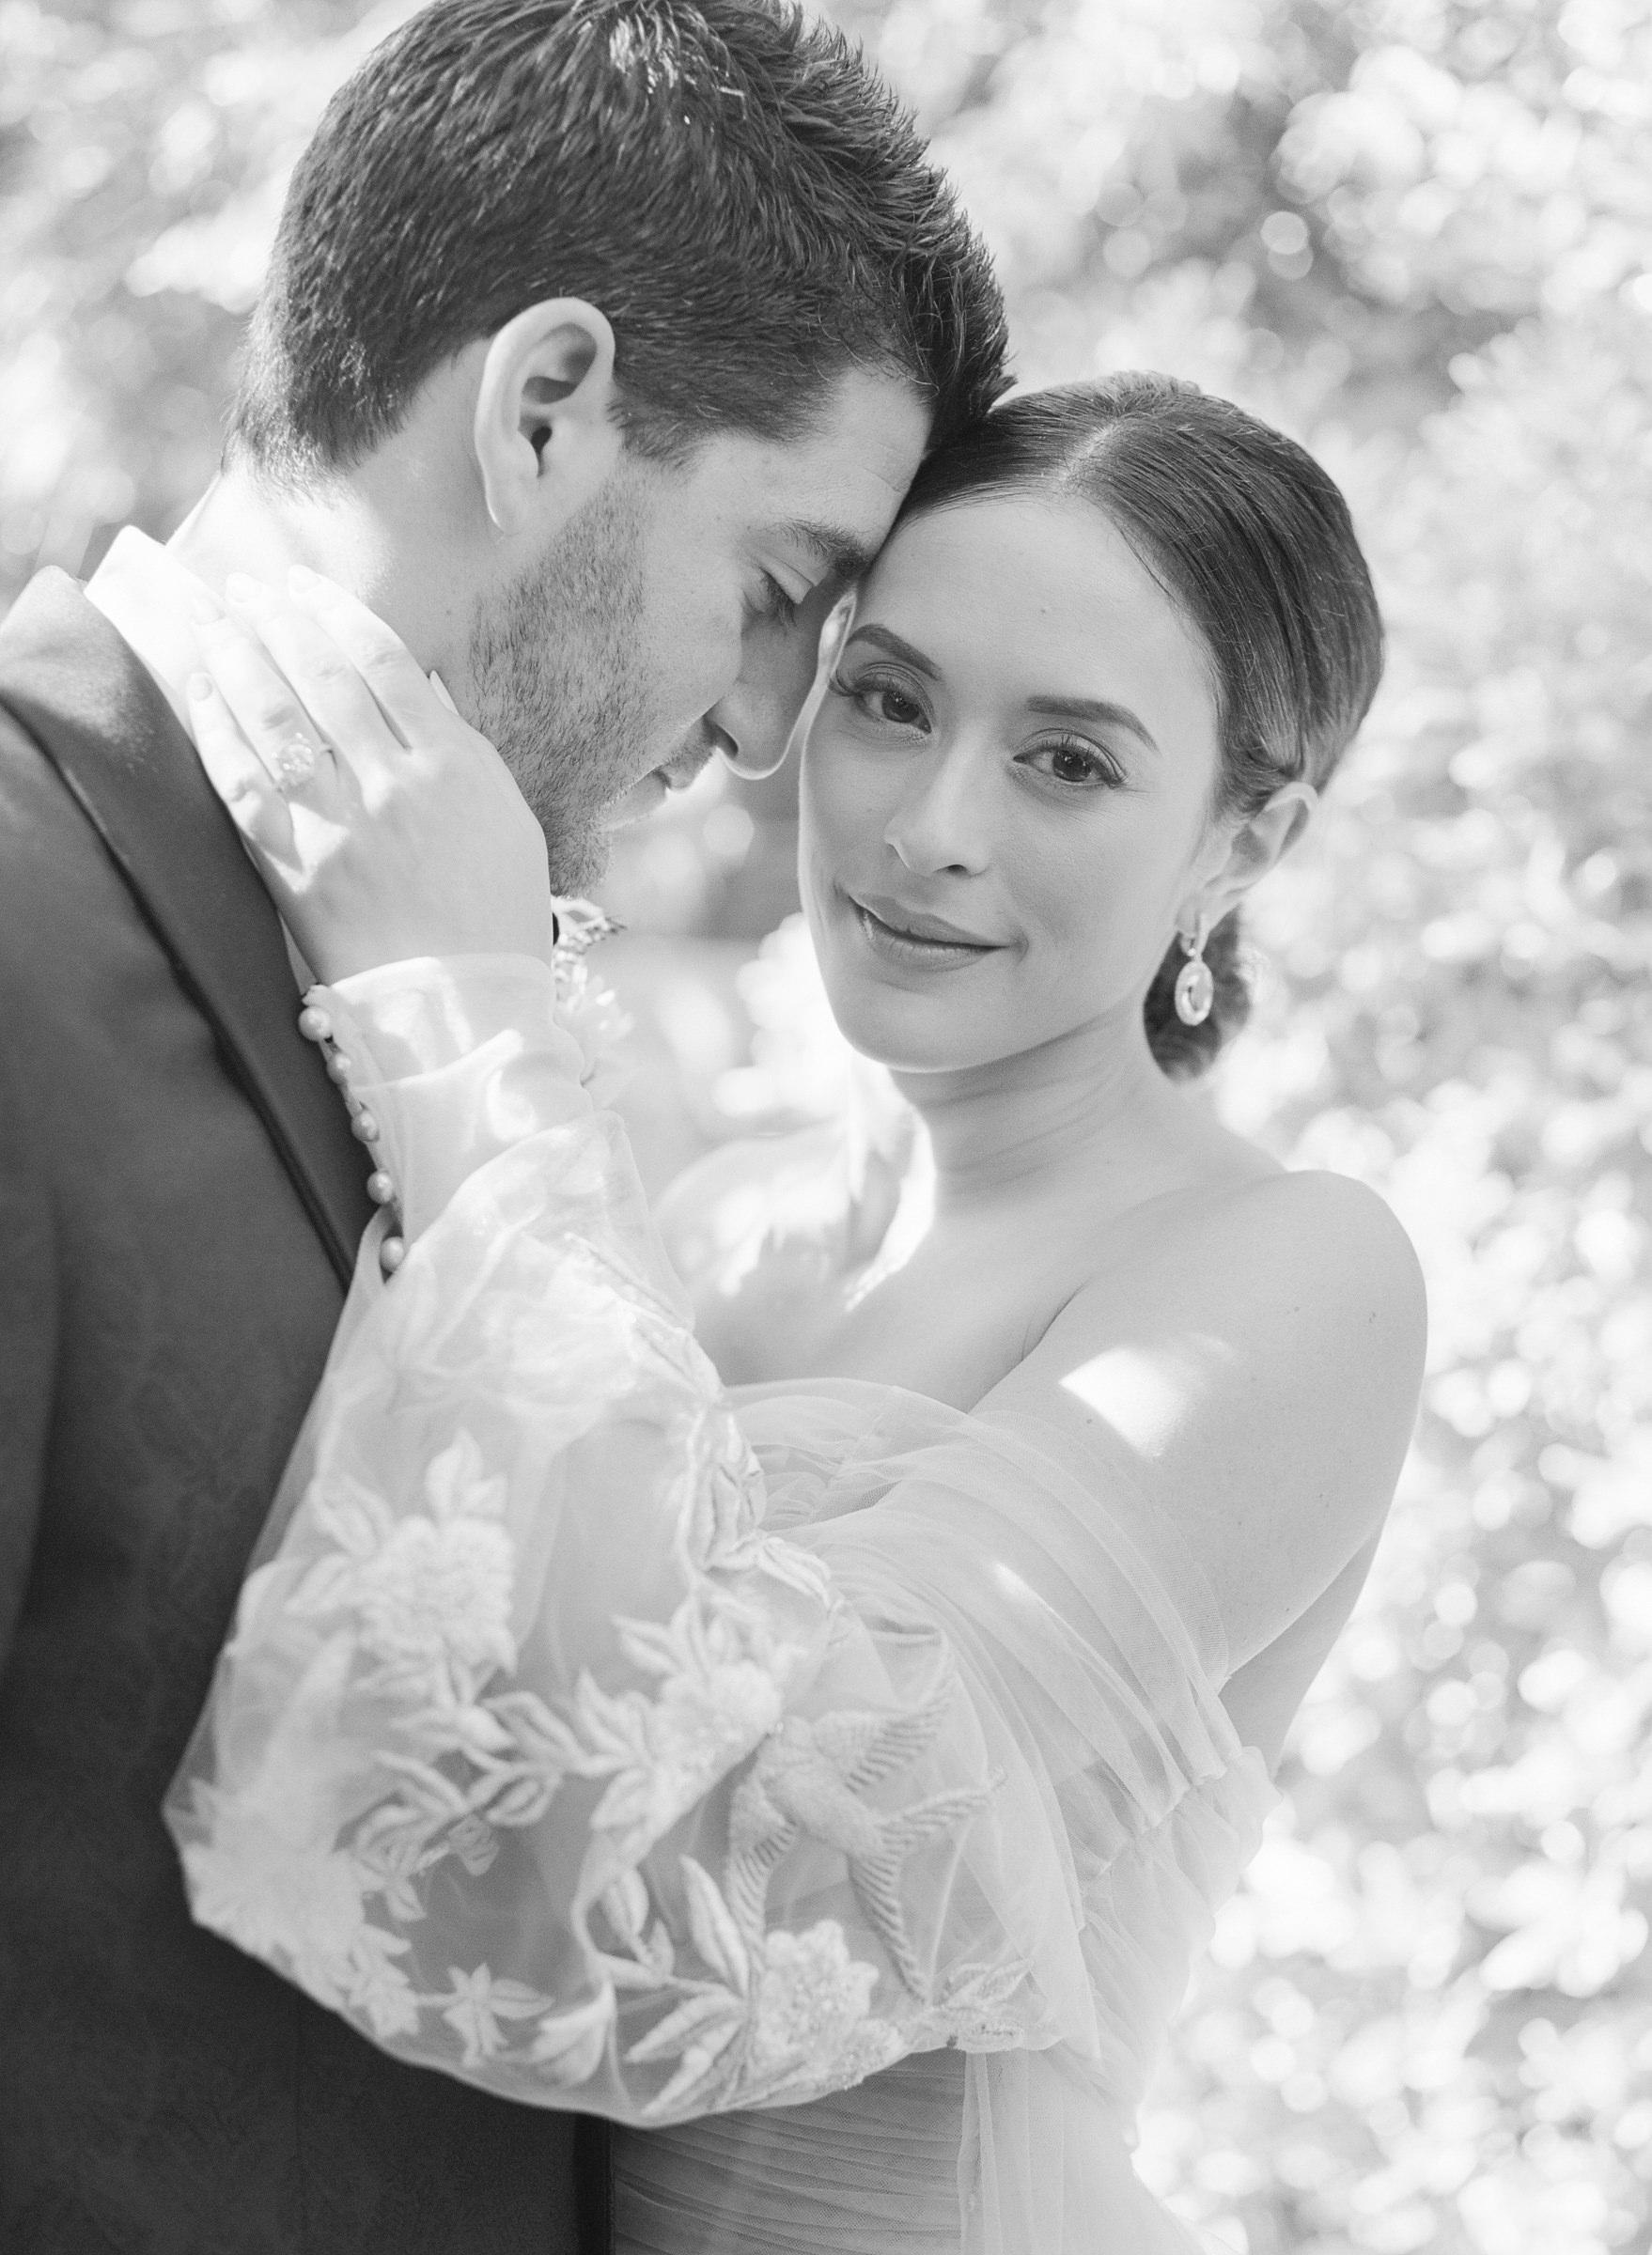 Romantic black and white portrait of bride and groom by Corbin Gurkin